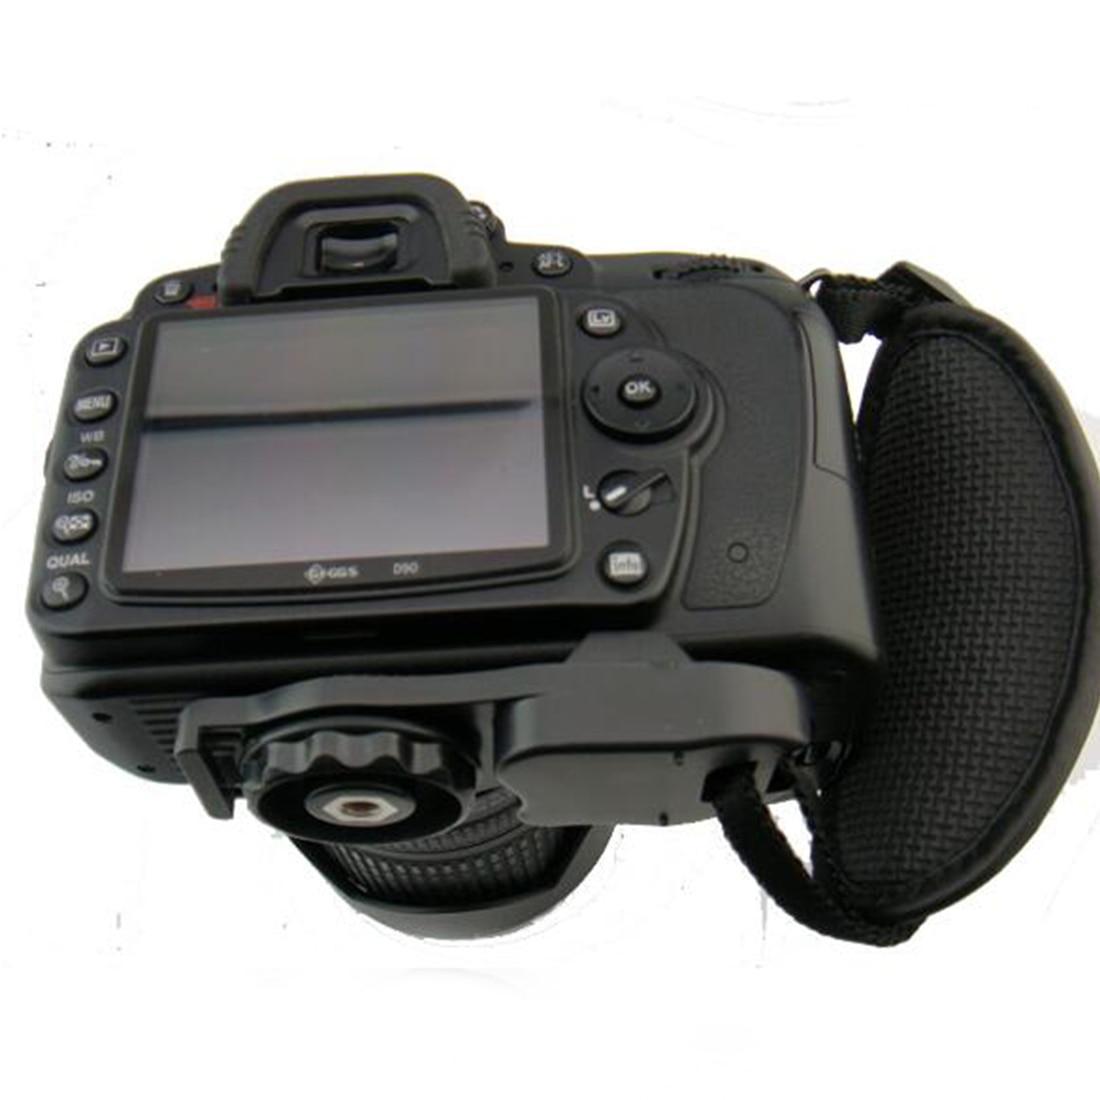 Centechia Camera Hand Strap Grip For Canon 5D Mark Ii 650D 550D 70D 60D 6D 7D Nikon D90 D600 D7100 D